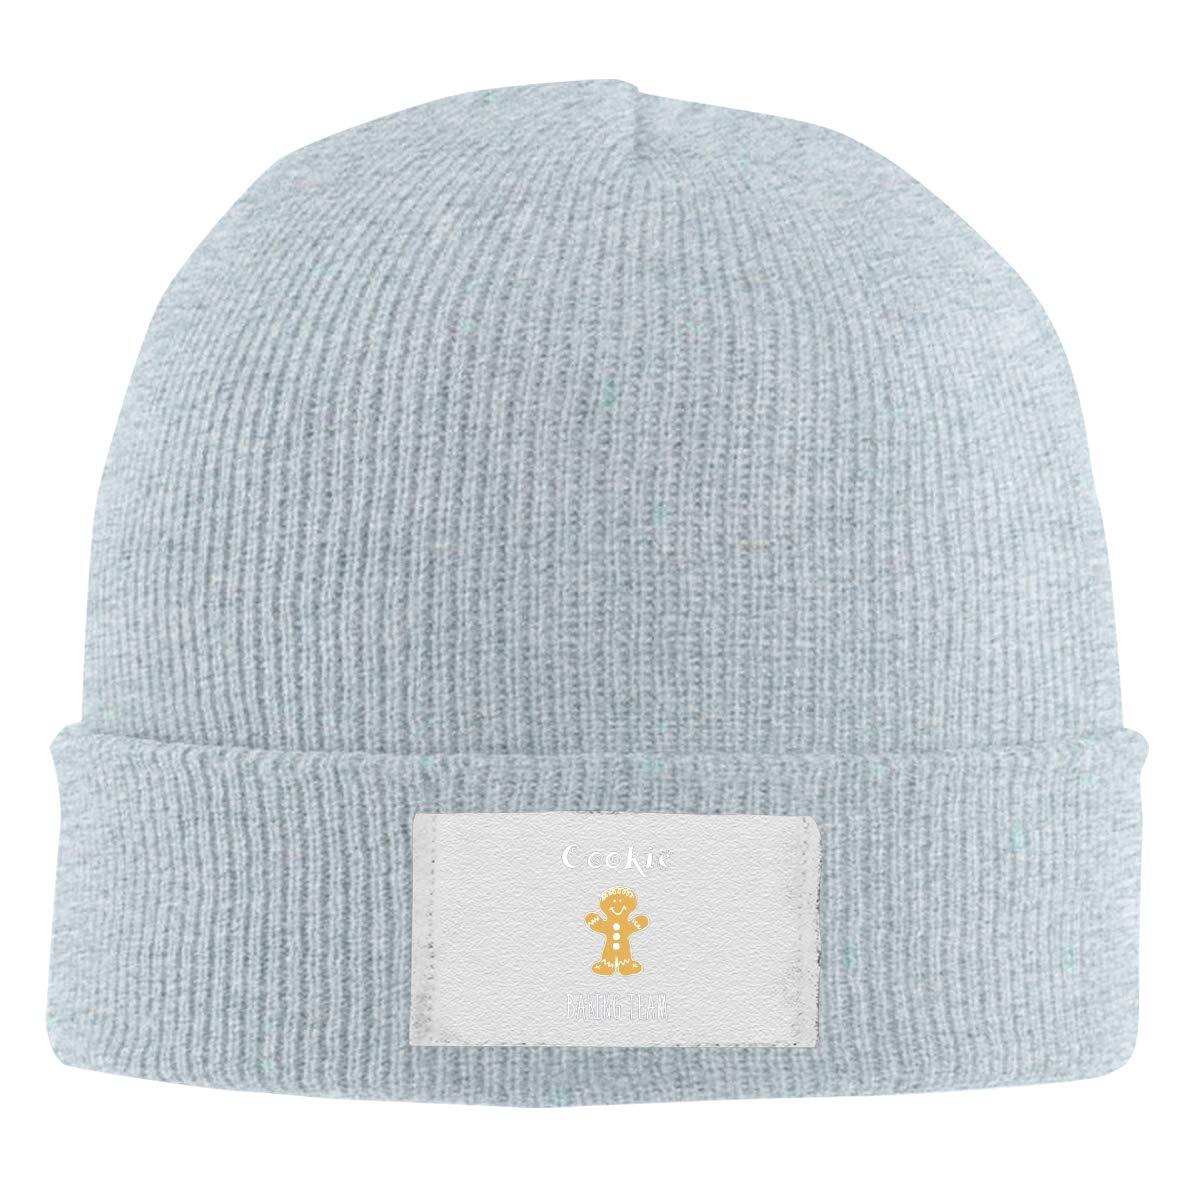 Dunpaiaa Skull Caps Cookie Baking Team Christmas Winter Warm Knit Hats Stretchy Cuff Beanie Hat Black